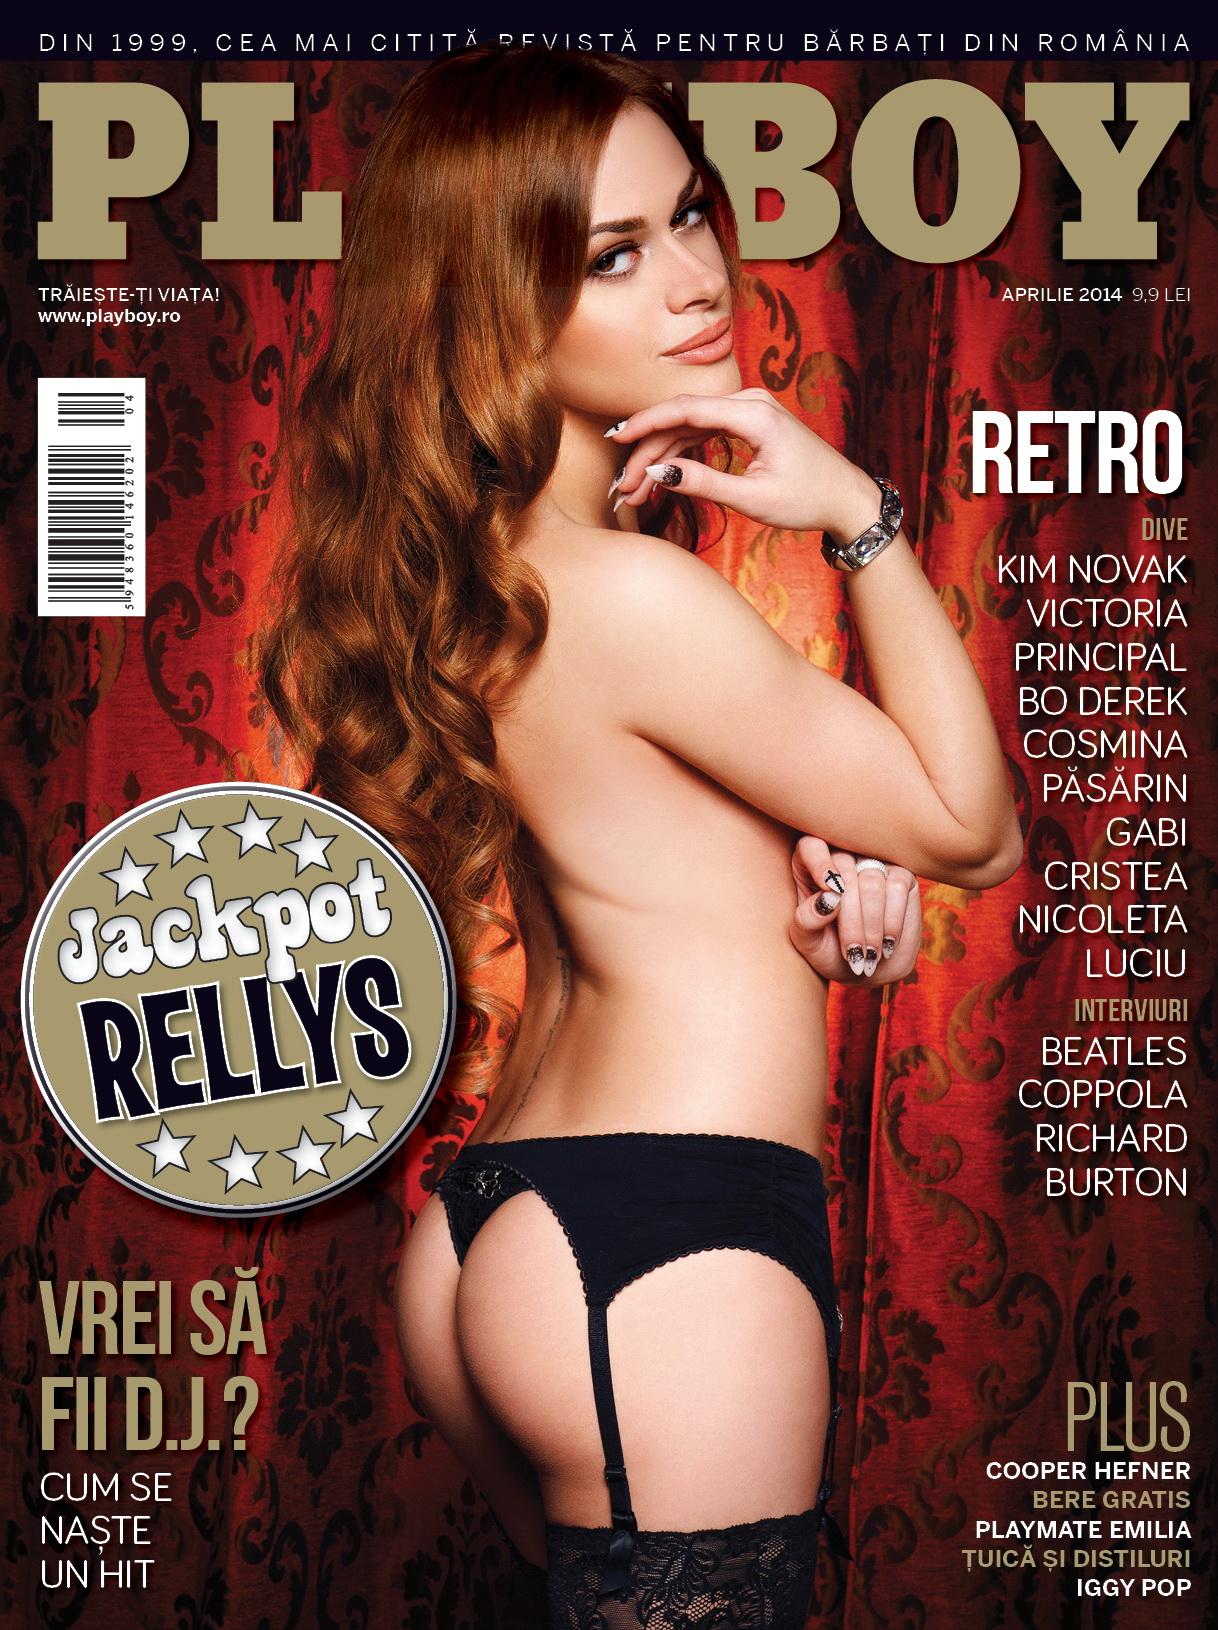 Rellys Tonu apare pe cea mai recenta coperta a revistei Playboy